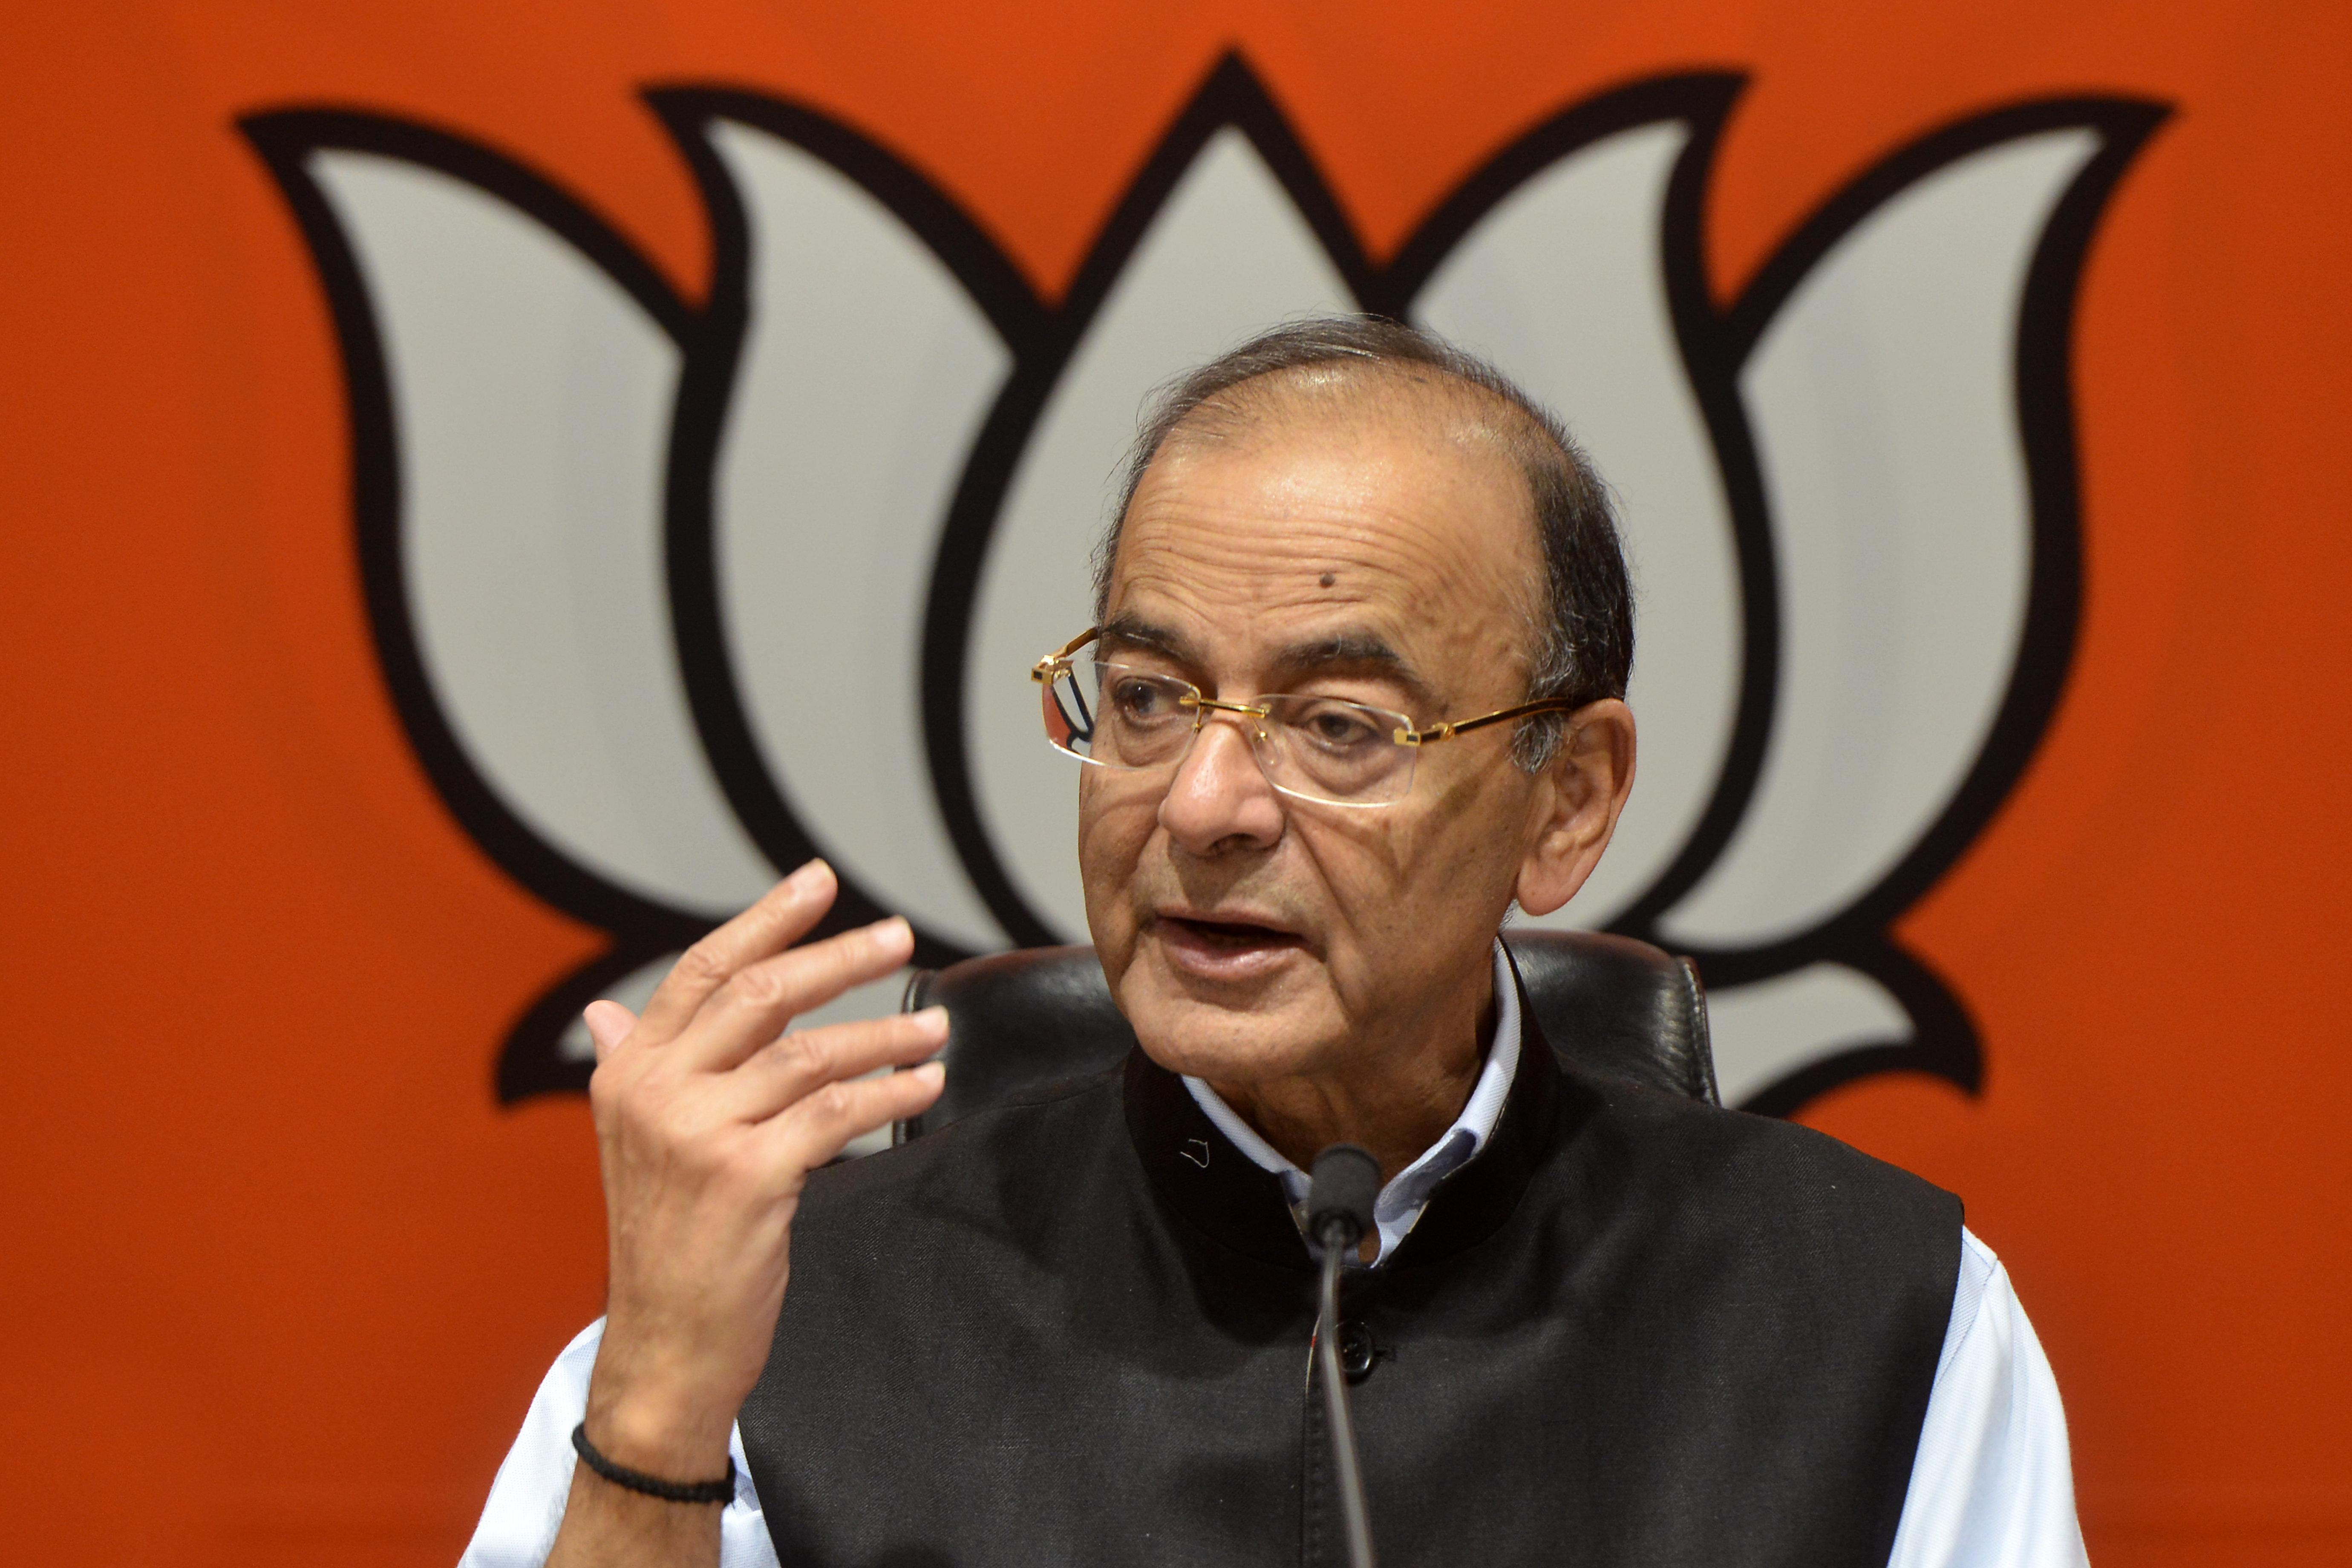 Congress Manifesto 'Dangerous And Unimplementable', Says Arun